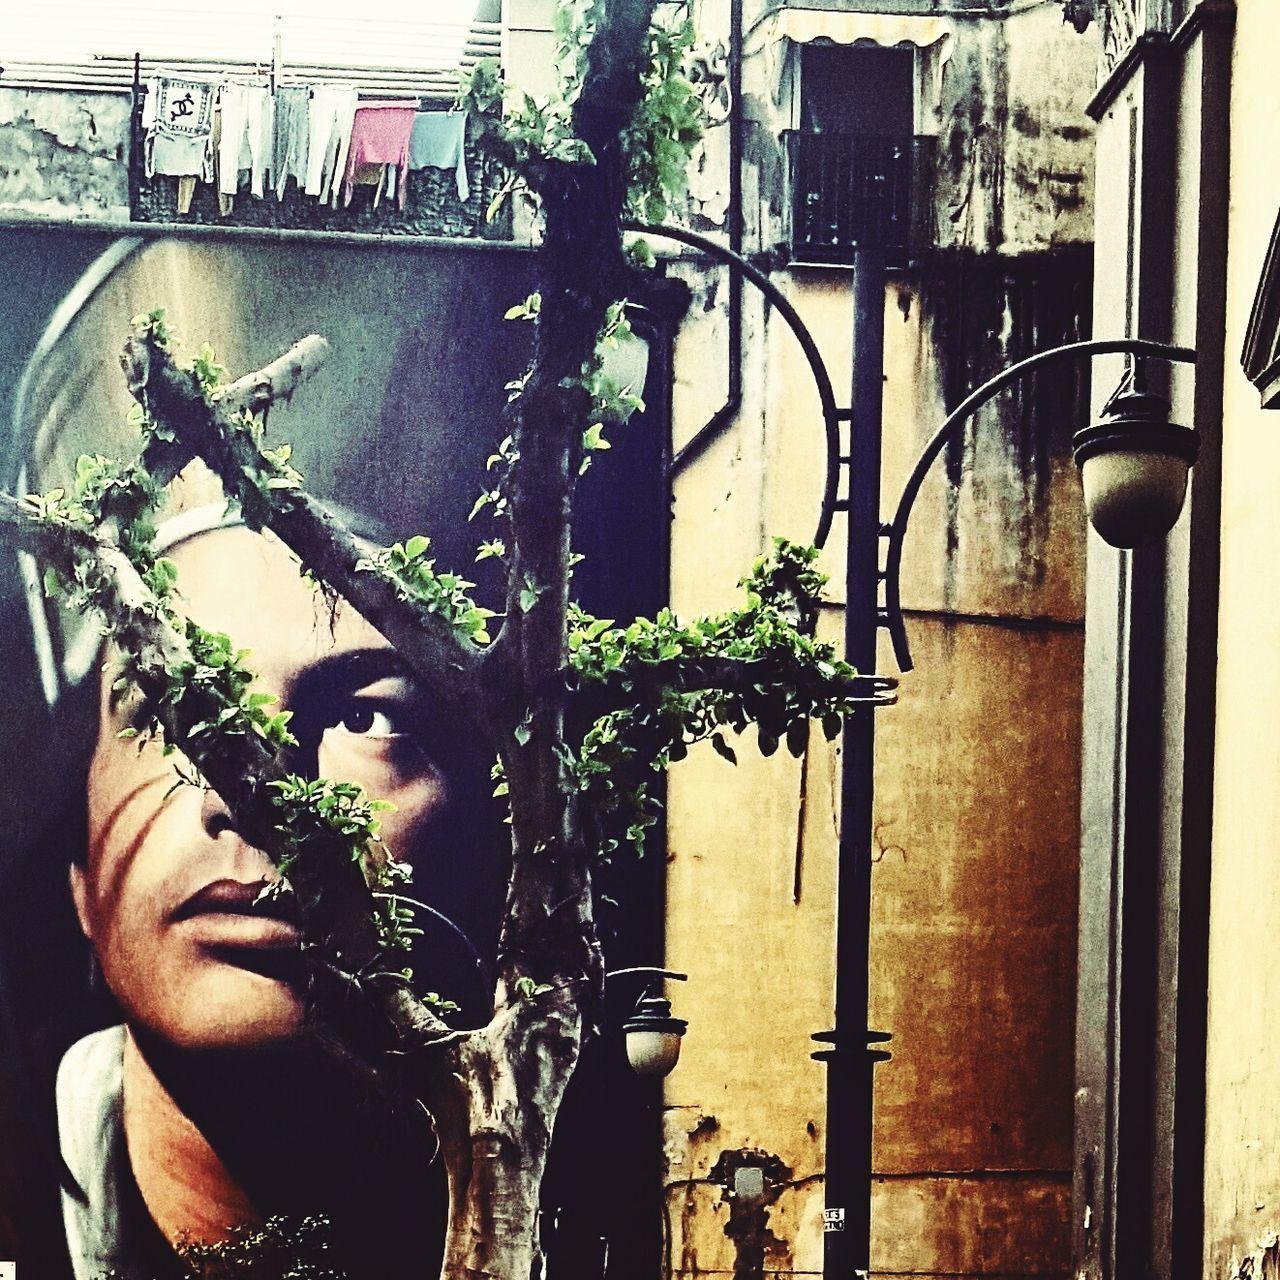 Quando la streetart incontra Napoli ❤ Streetart StreetArtEverywhere Naples Napoliphotoproject Napoli Sangennaro Rione Forcella Centrostorico Centrostoriconapoli Italy🇮🇹 Siituristadellatuacittá Outdoors